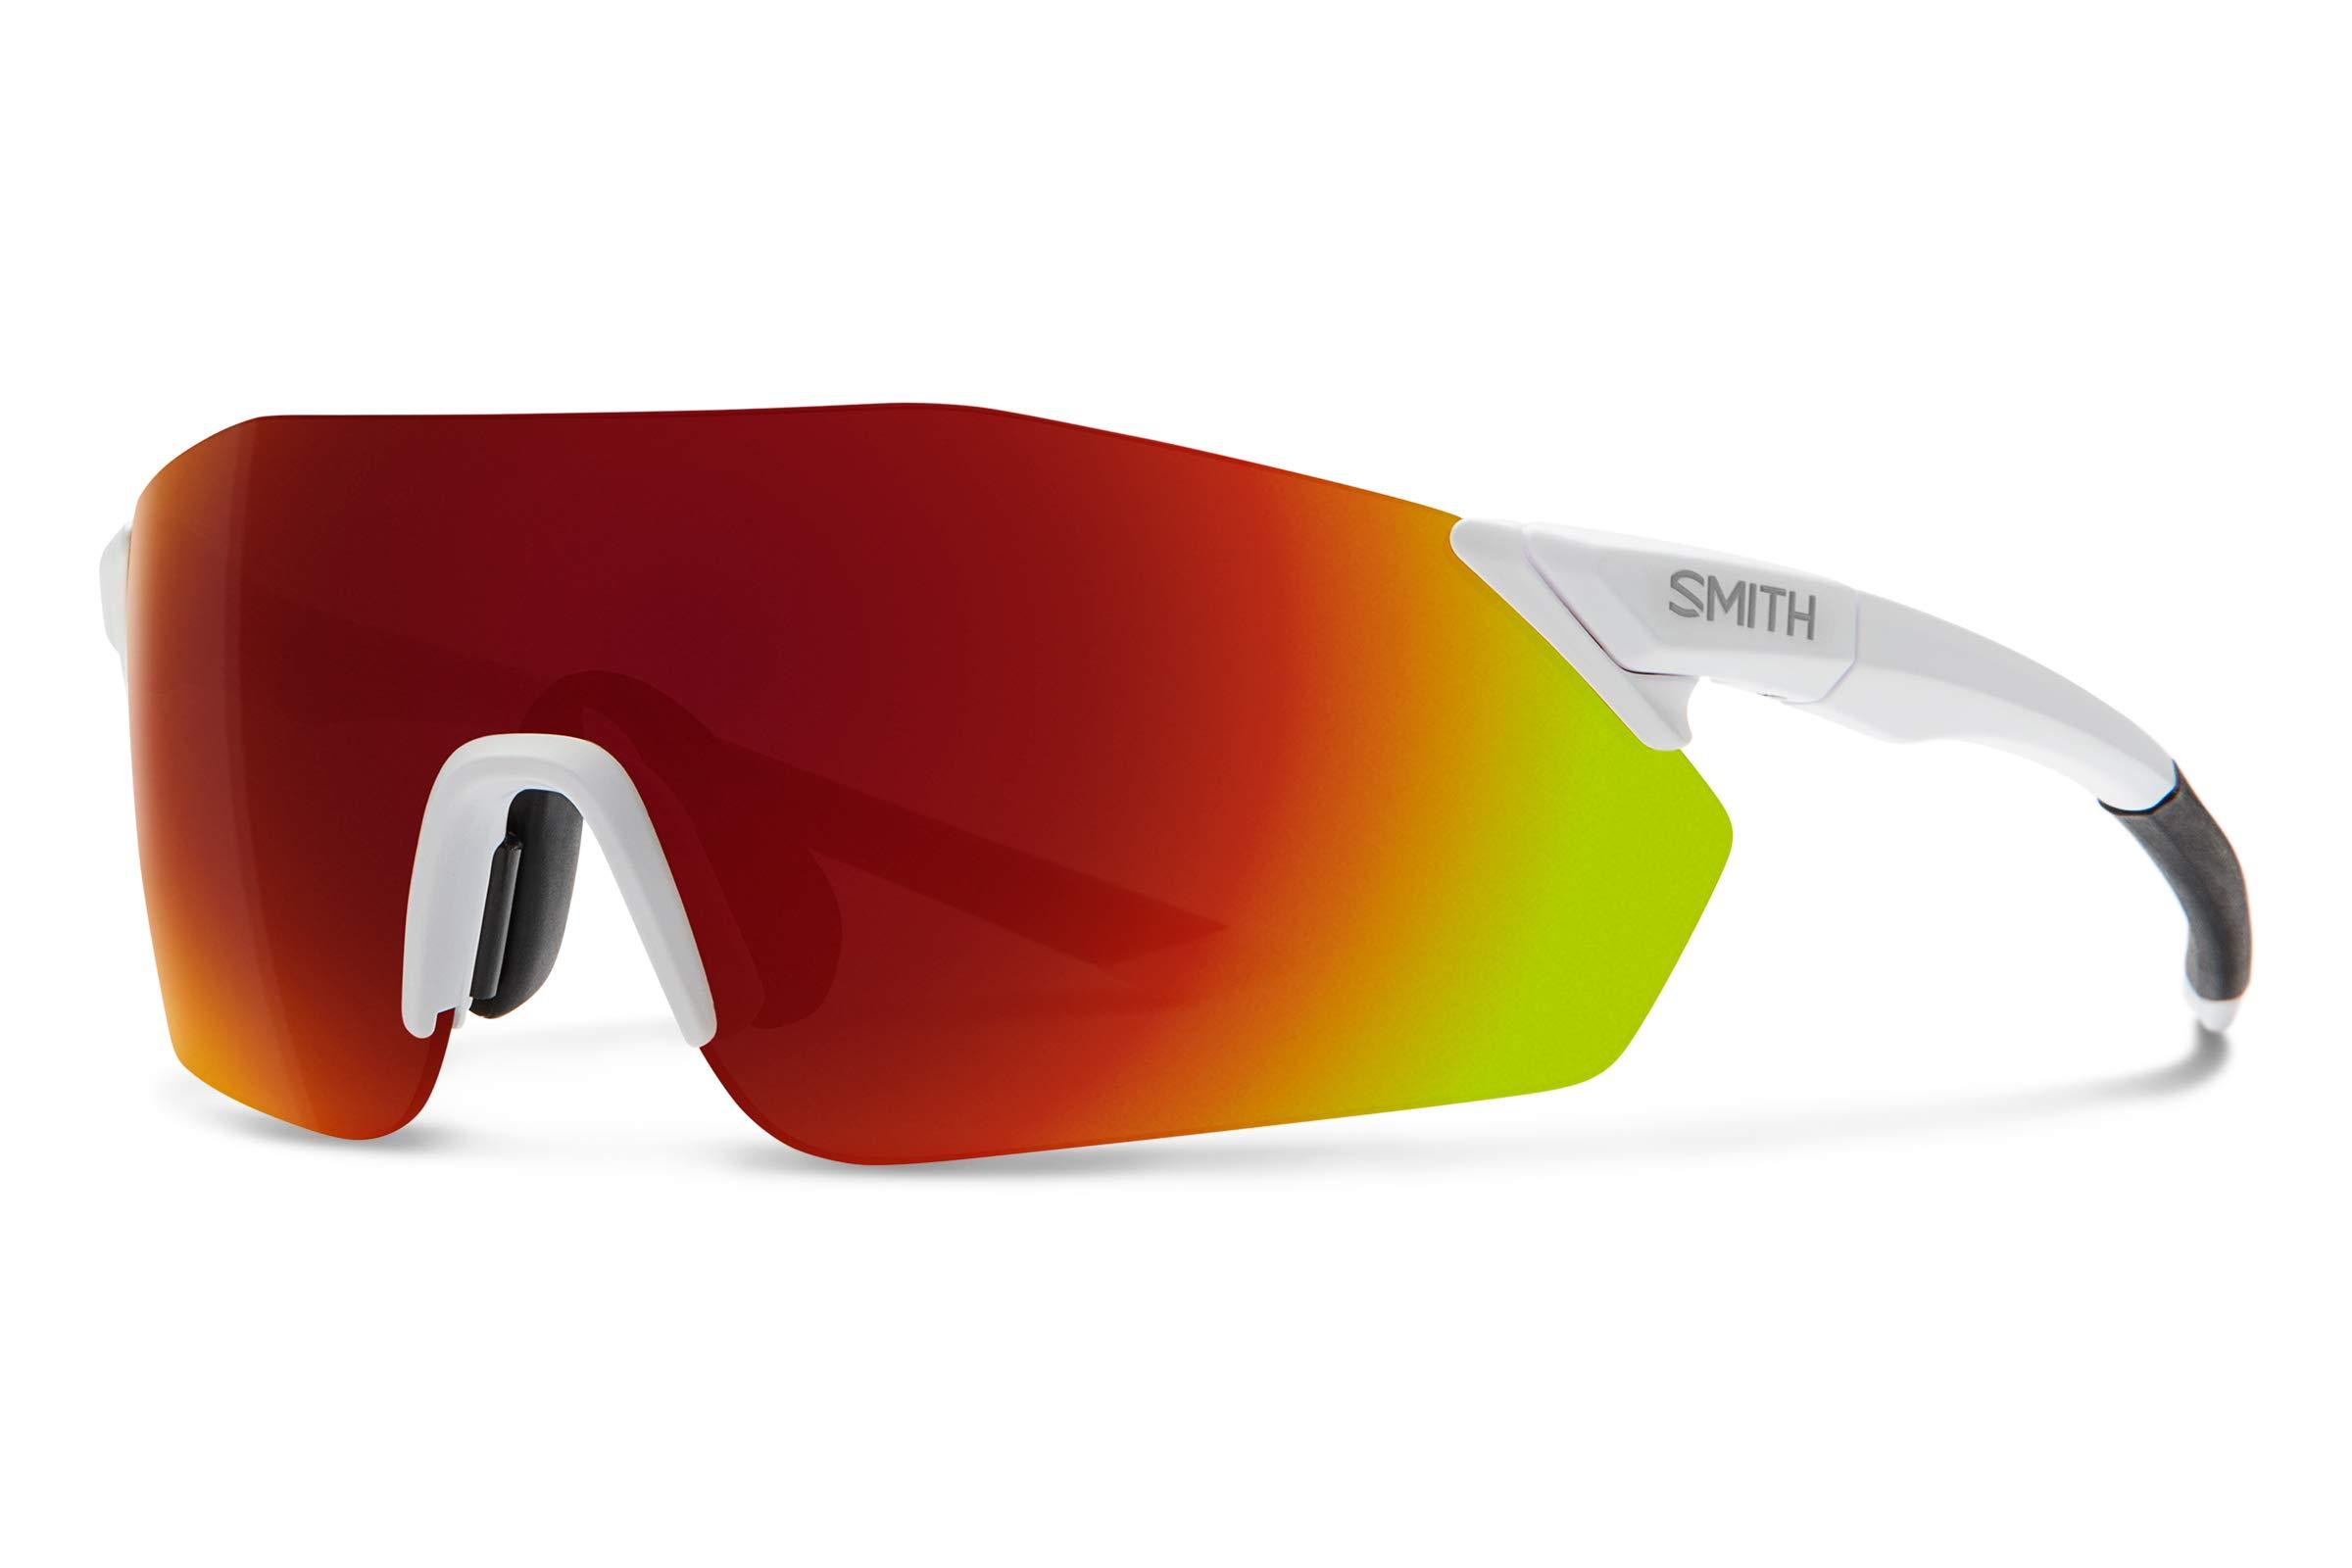 Smith Reverb Chromapop Sunglasses, Matte White, Chromapop Sun Red Mirror/Contrast Rose